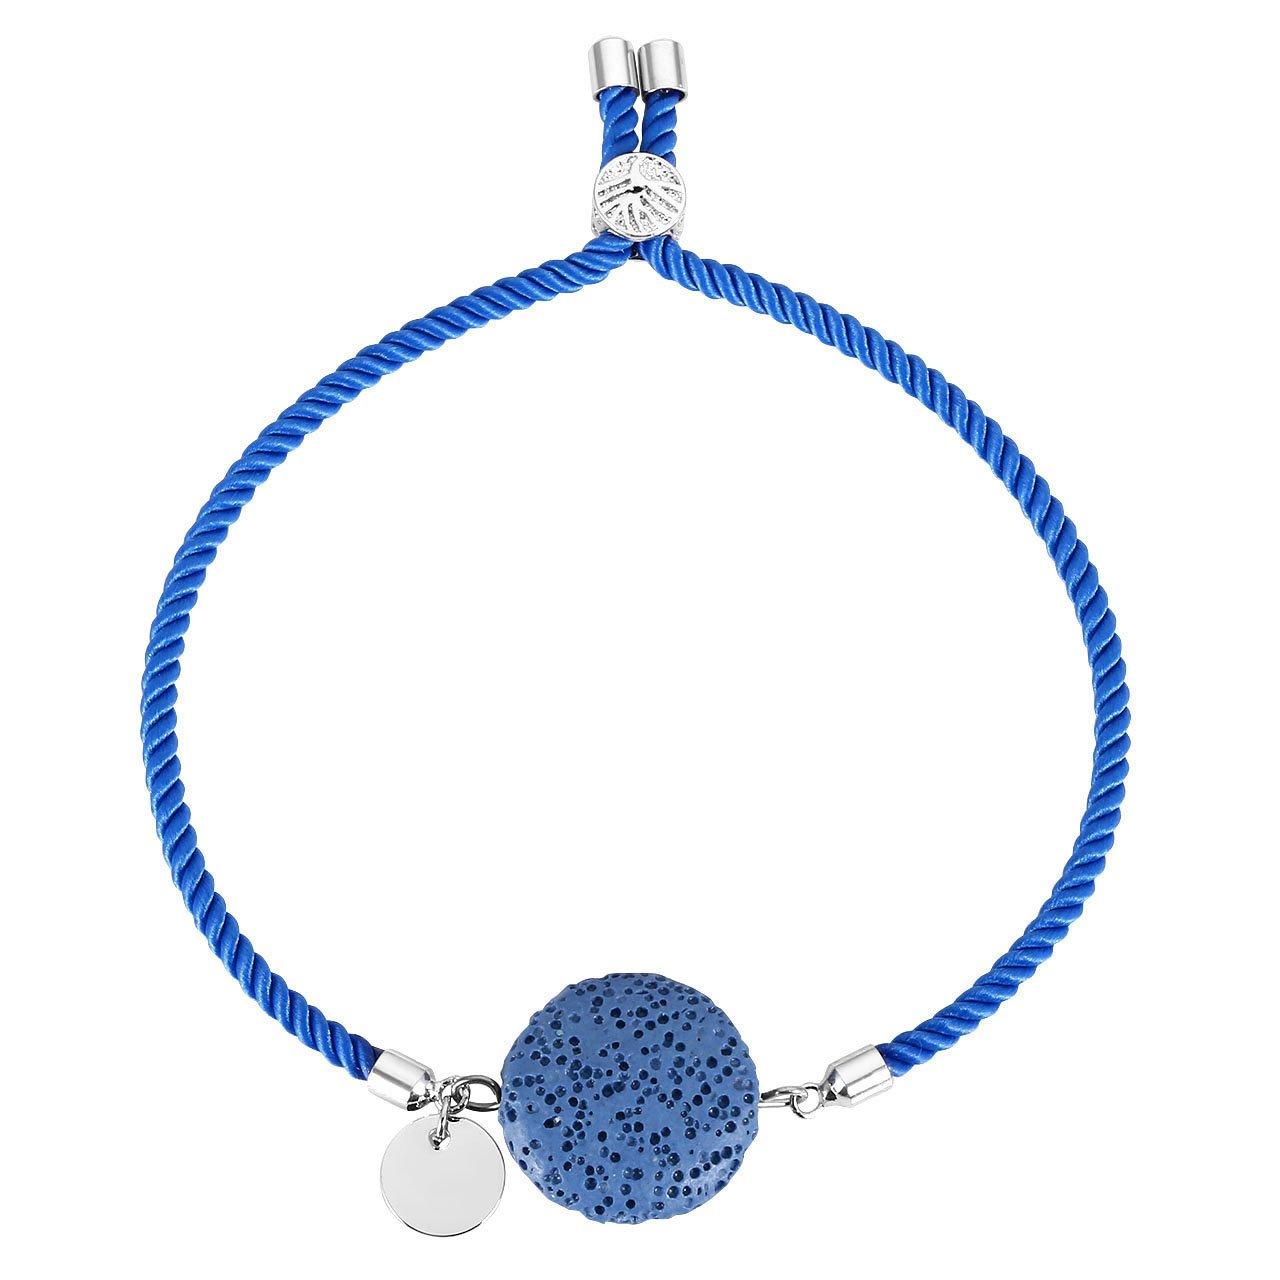 Friendship Bracelets Best Gift-Sky Blue CrystalTears Round Lava Rock Stone Diffuser for Essential Oil,Tree of Life Wrist Bracelet